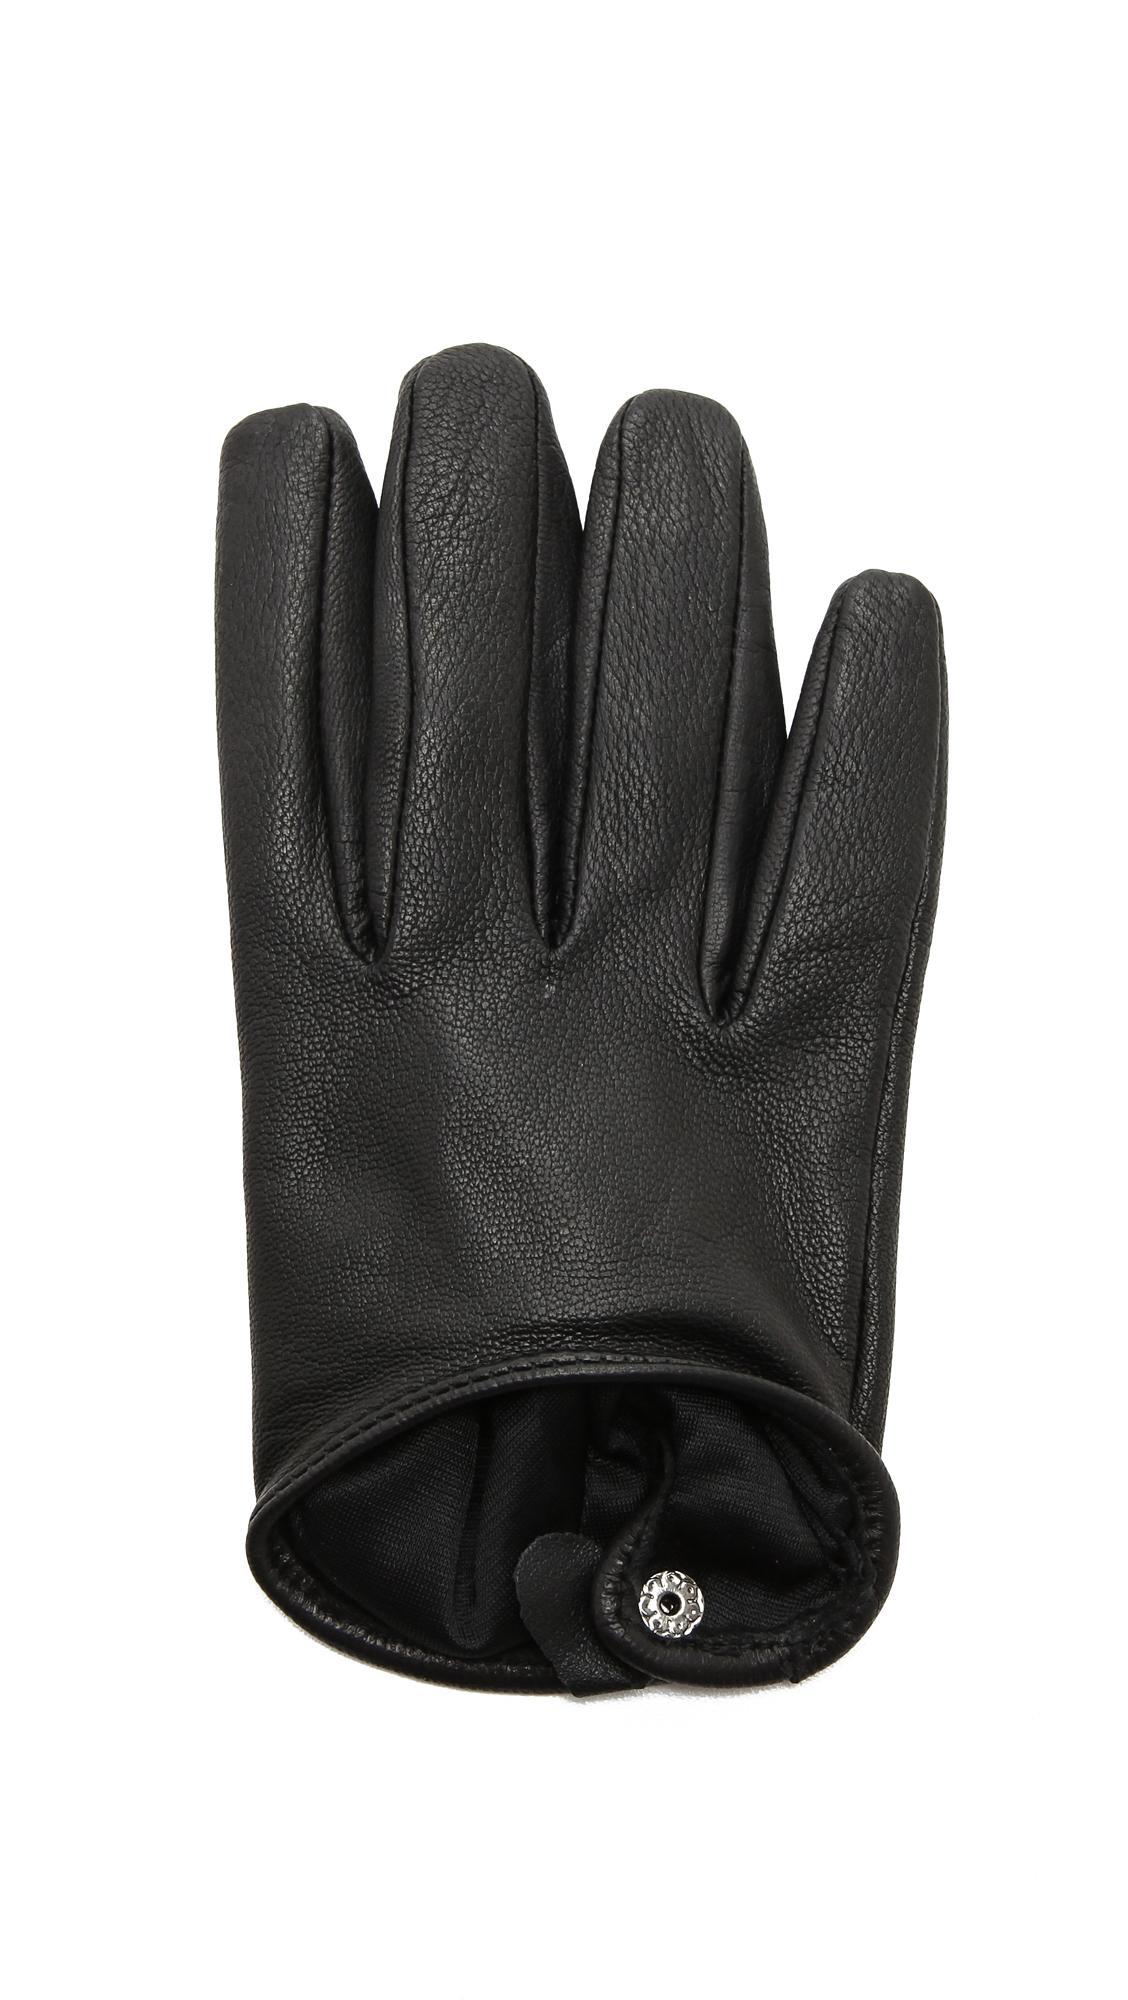 Ladies leather gloves selfridges - View Fullscreen